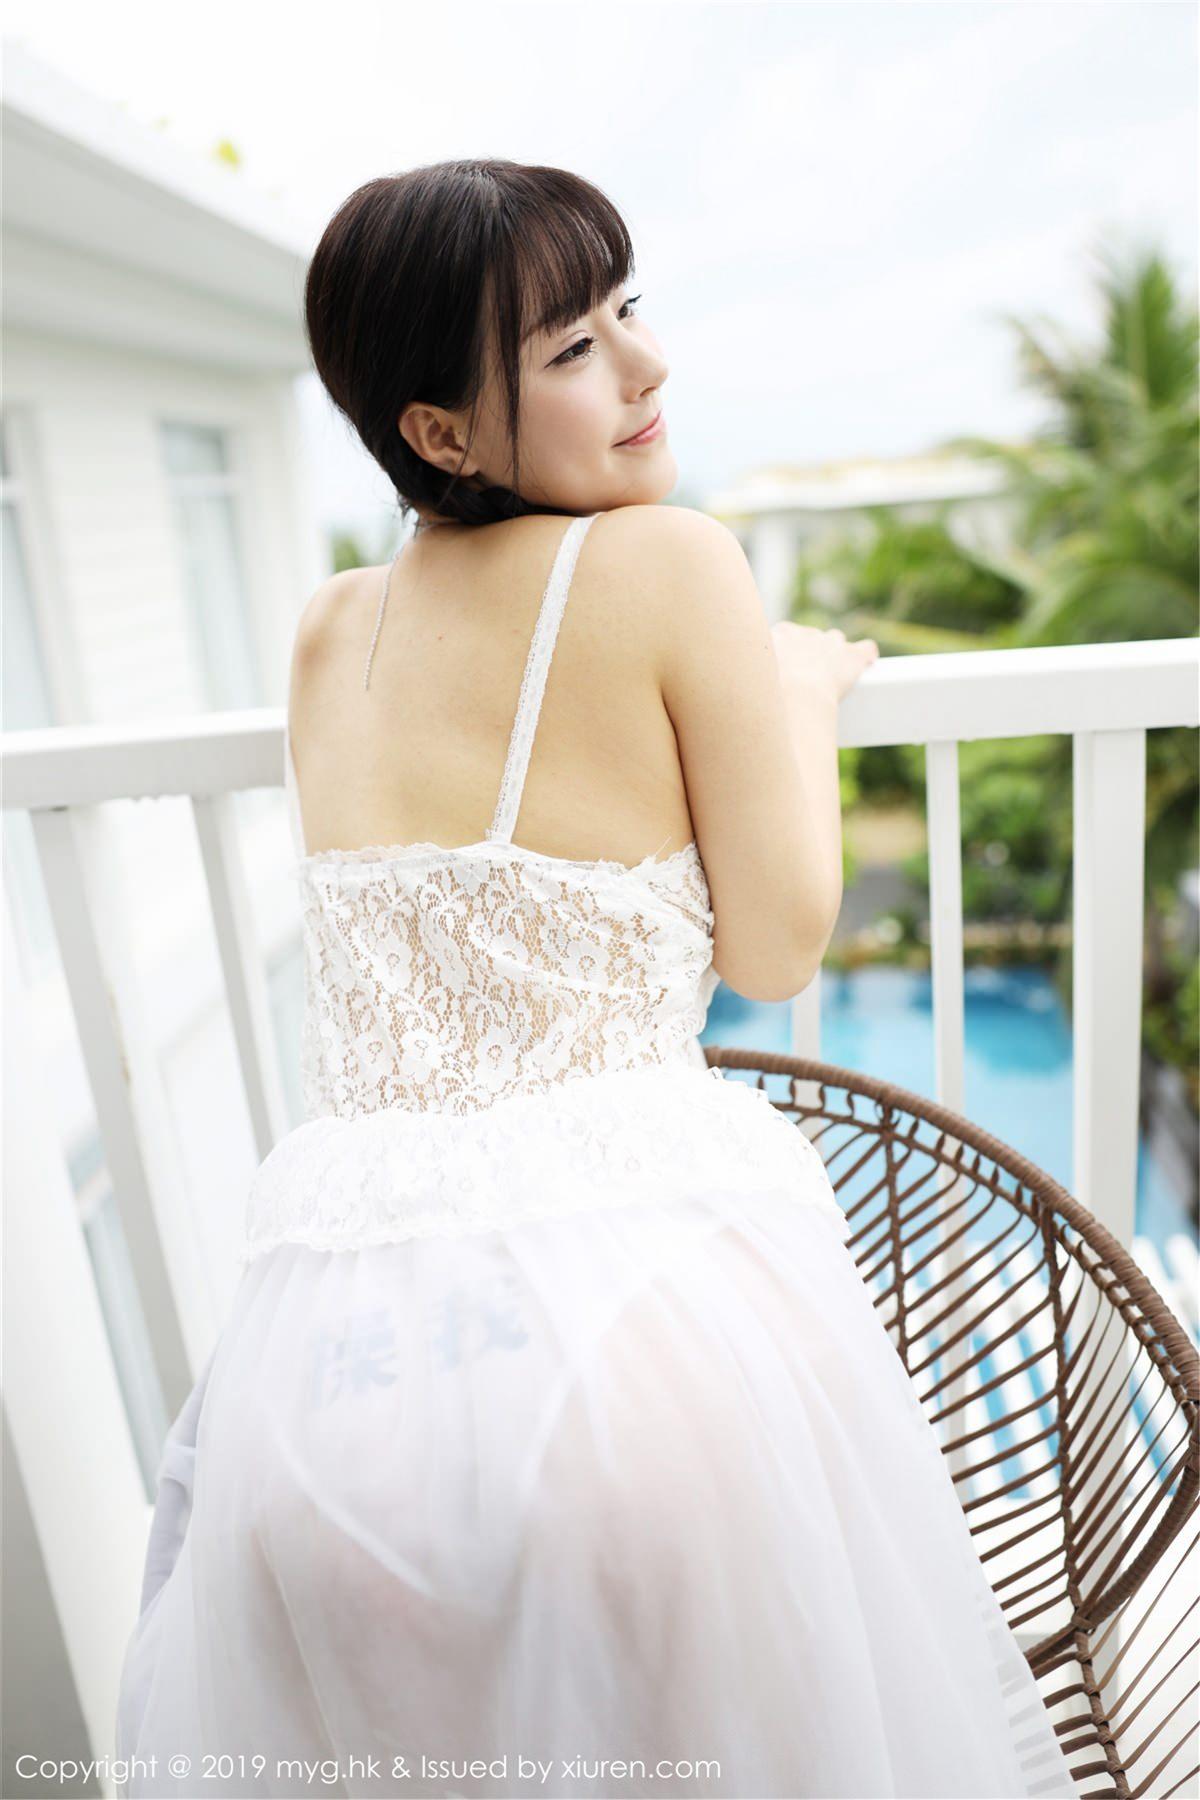 MyGirl Vol.360 39P, mygirl, Zhu Ke Er